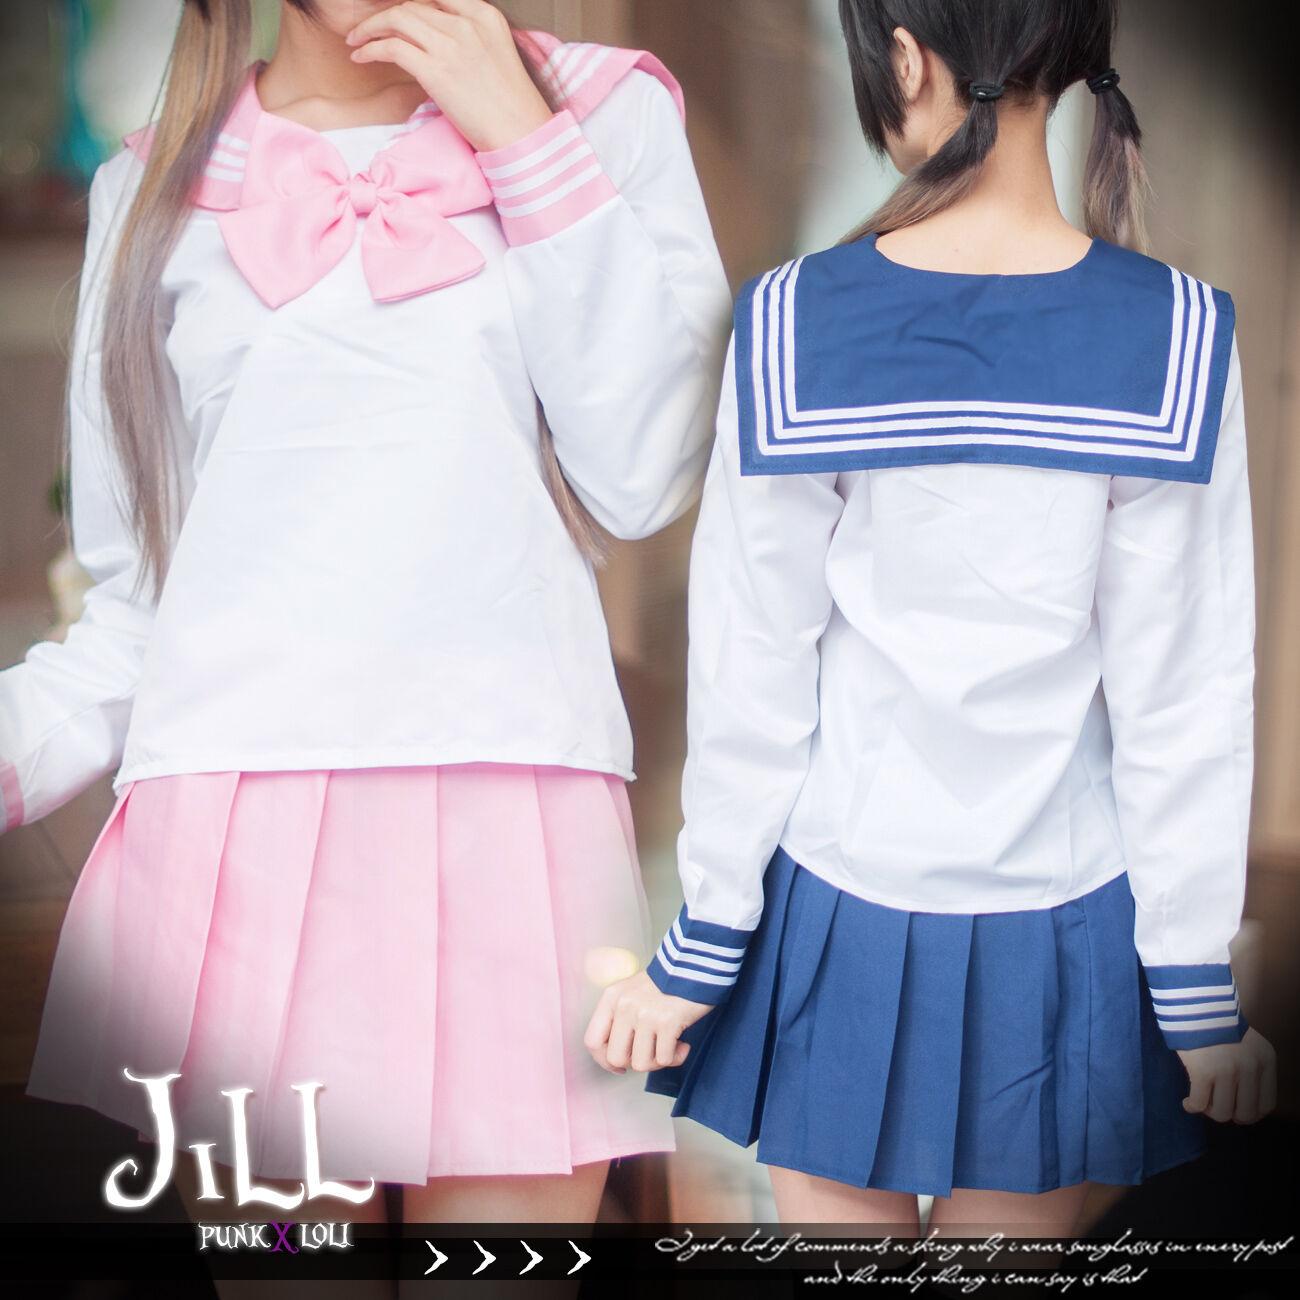 japan anime cosplay Shana of blazing eyes highschool sailor costume 2pc J3F3001